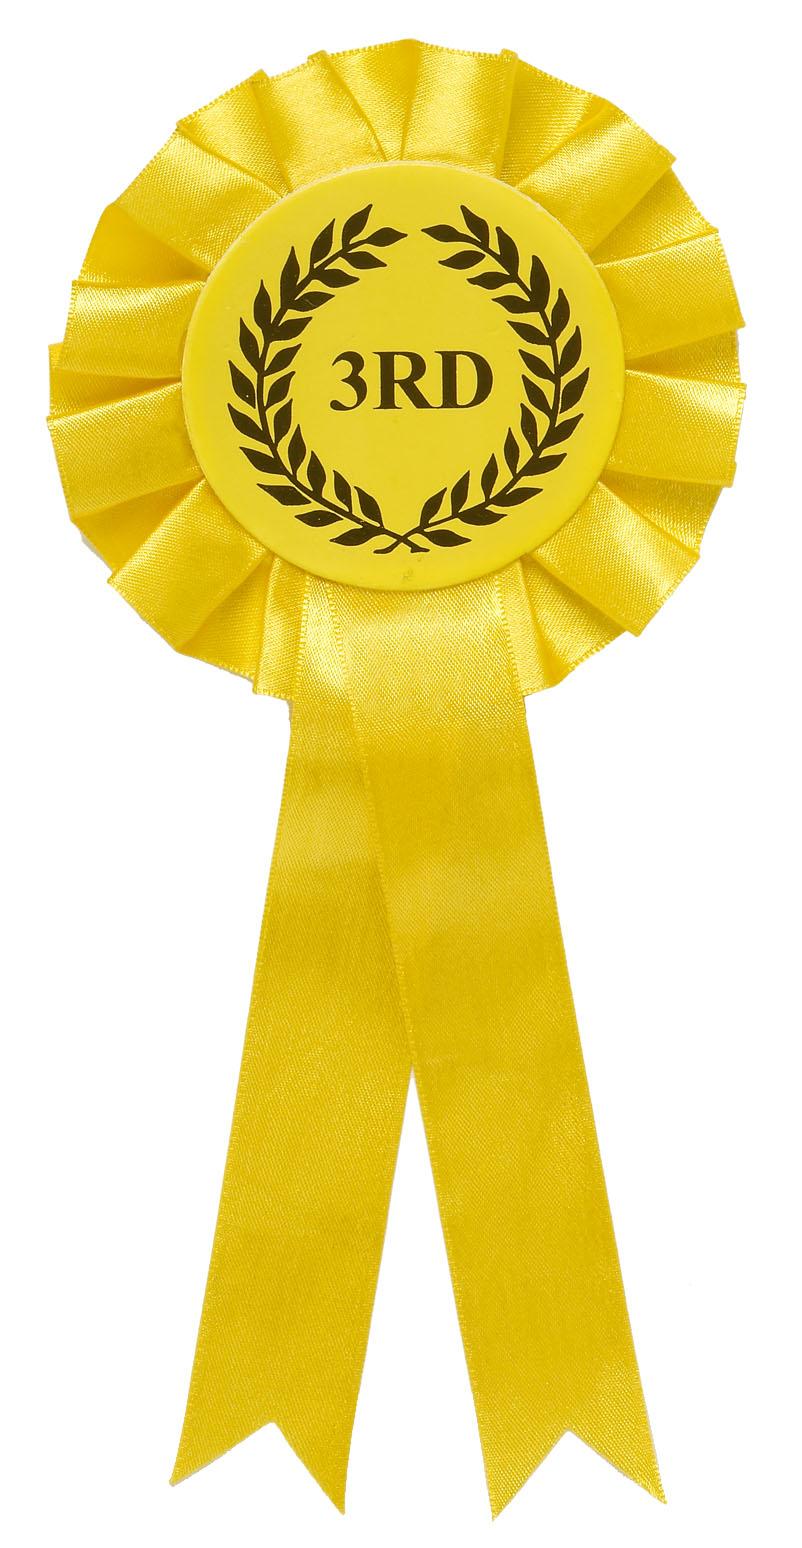 3rd Place Ribbon Clip Art N13 free image.